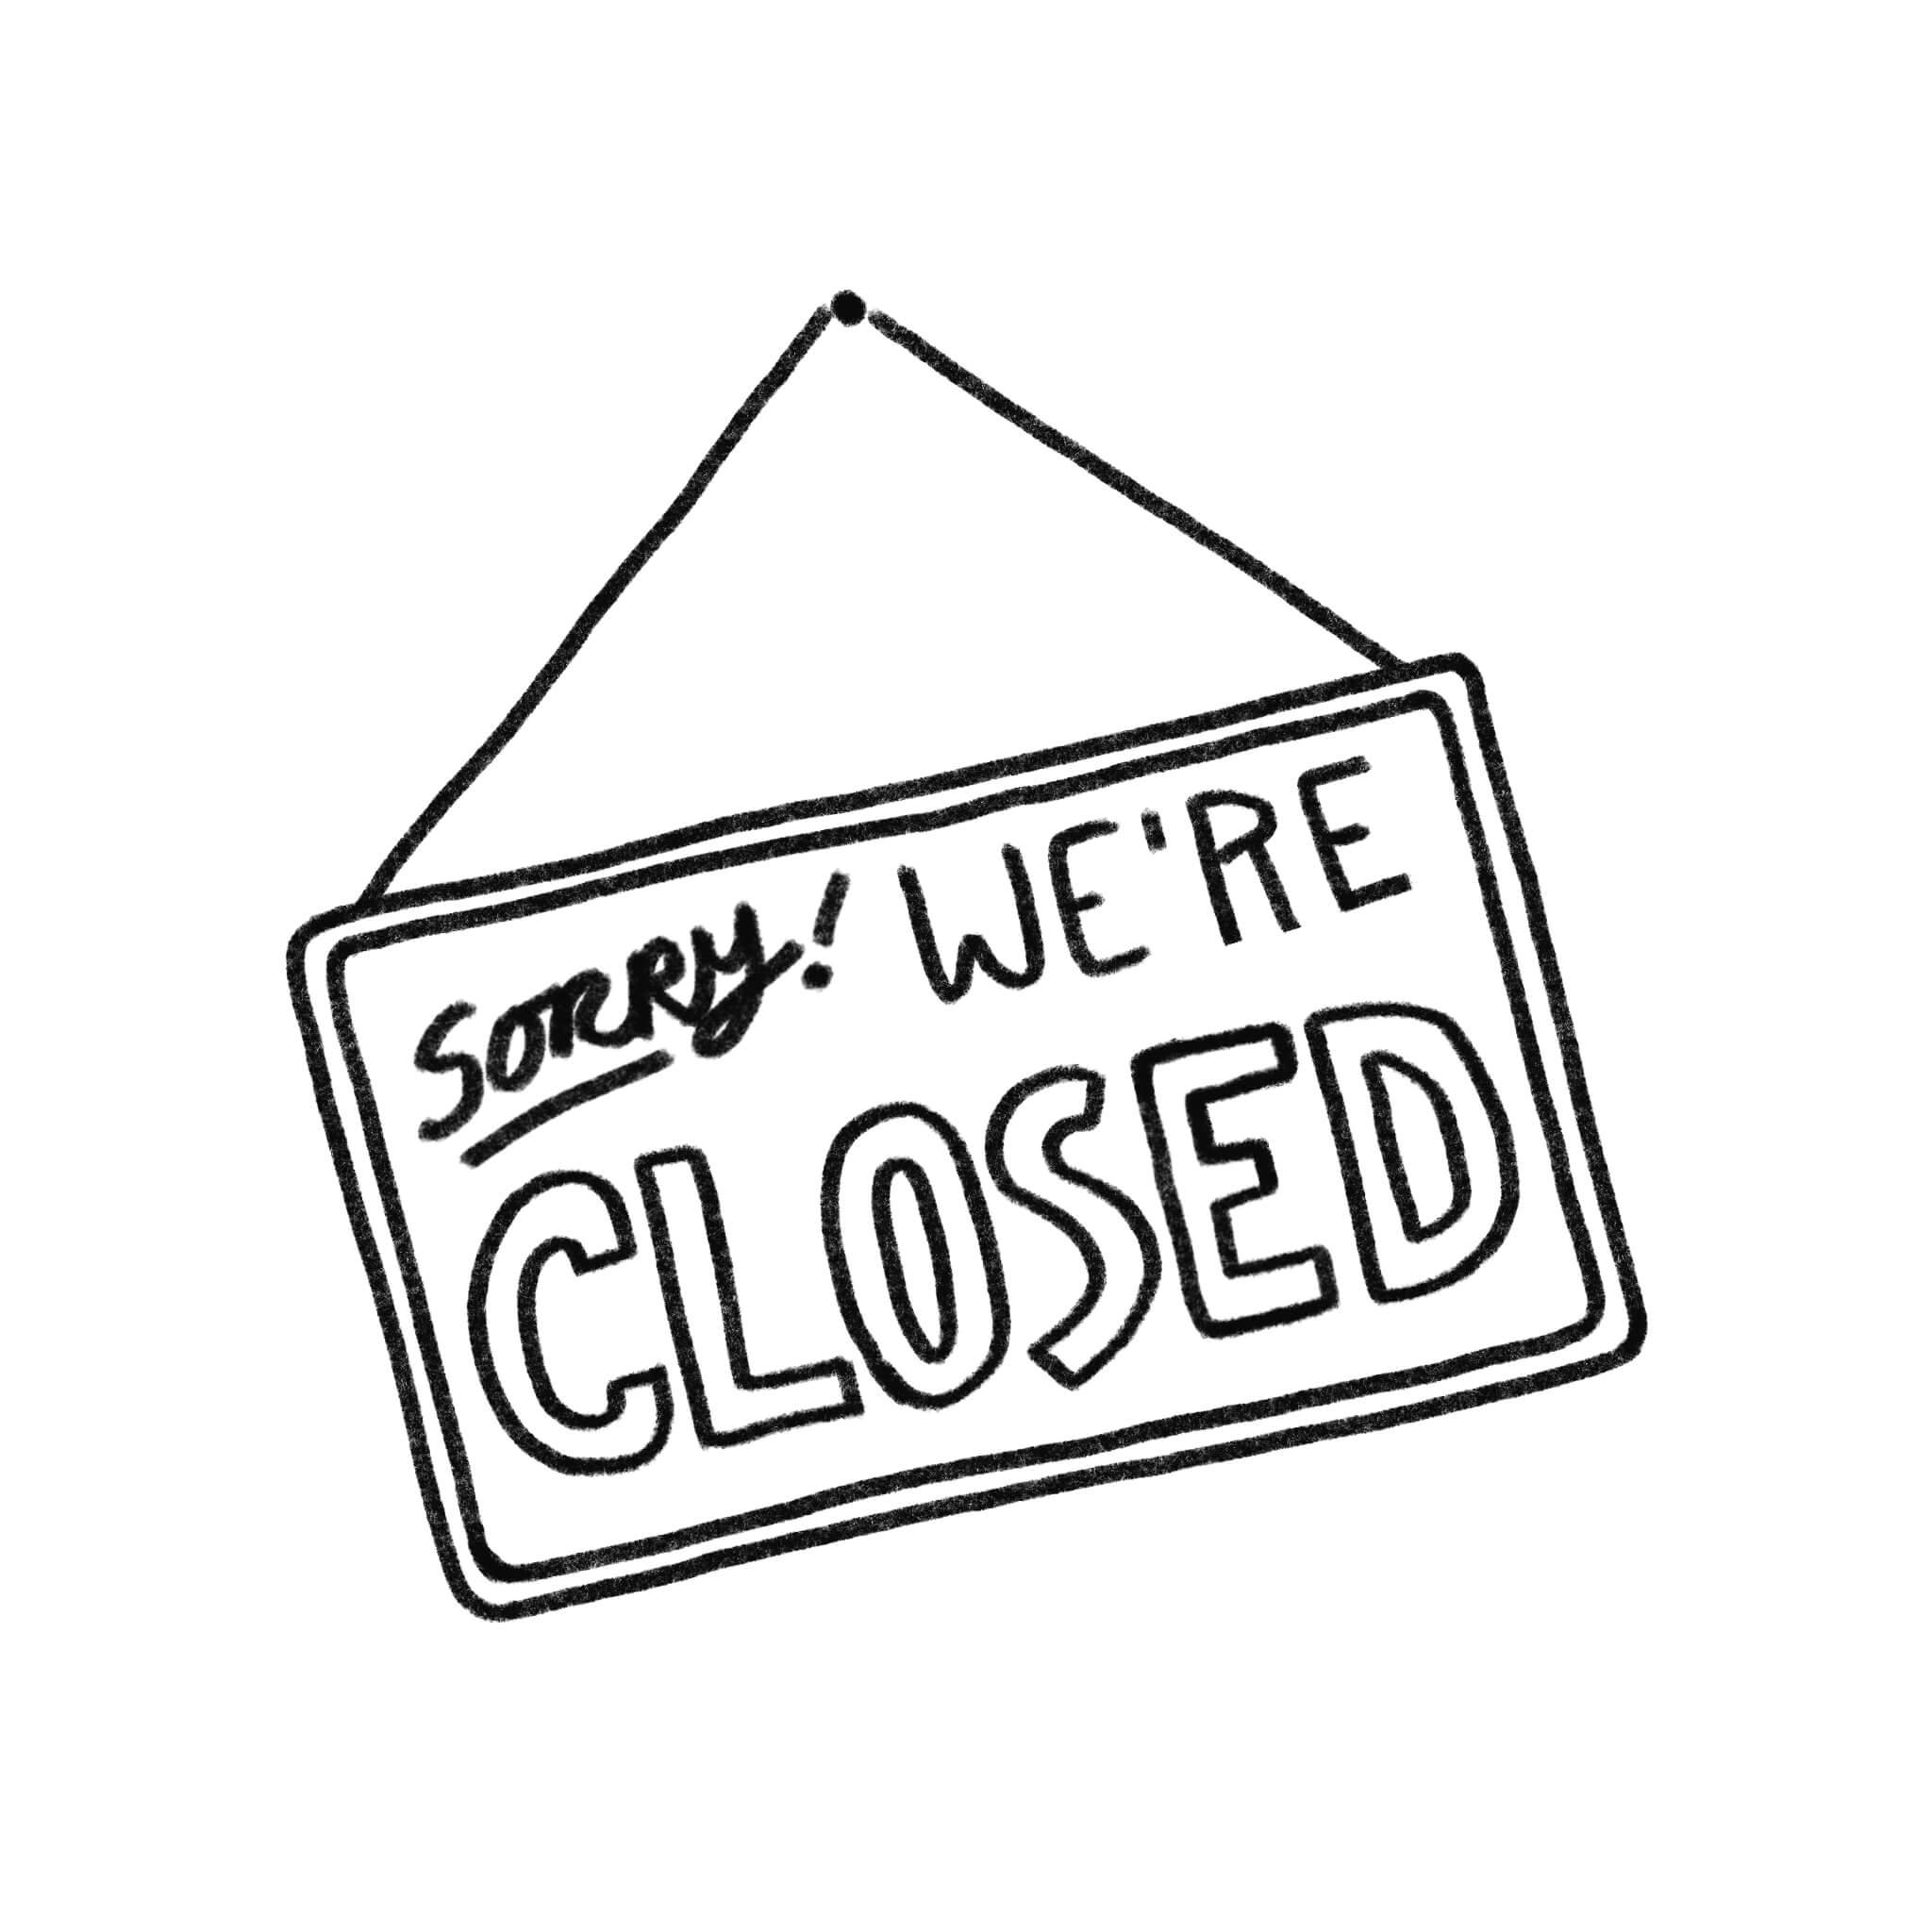 LATIMES-031920-spots_1-closed